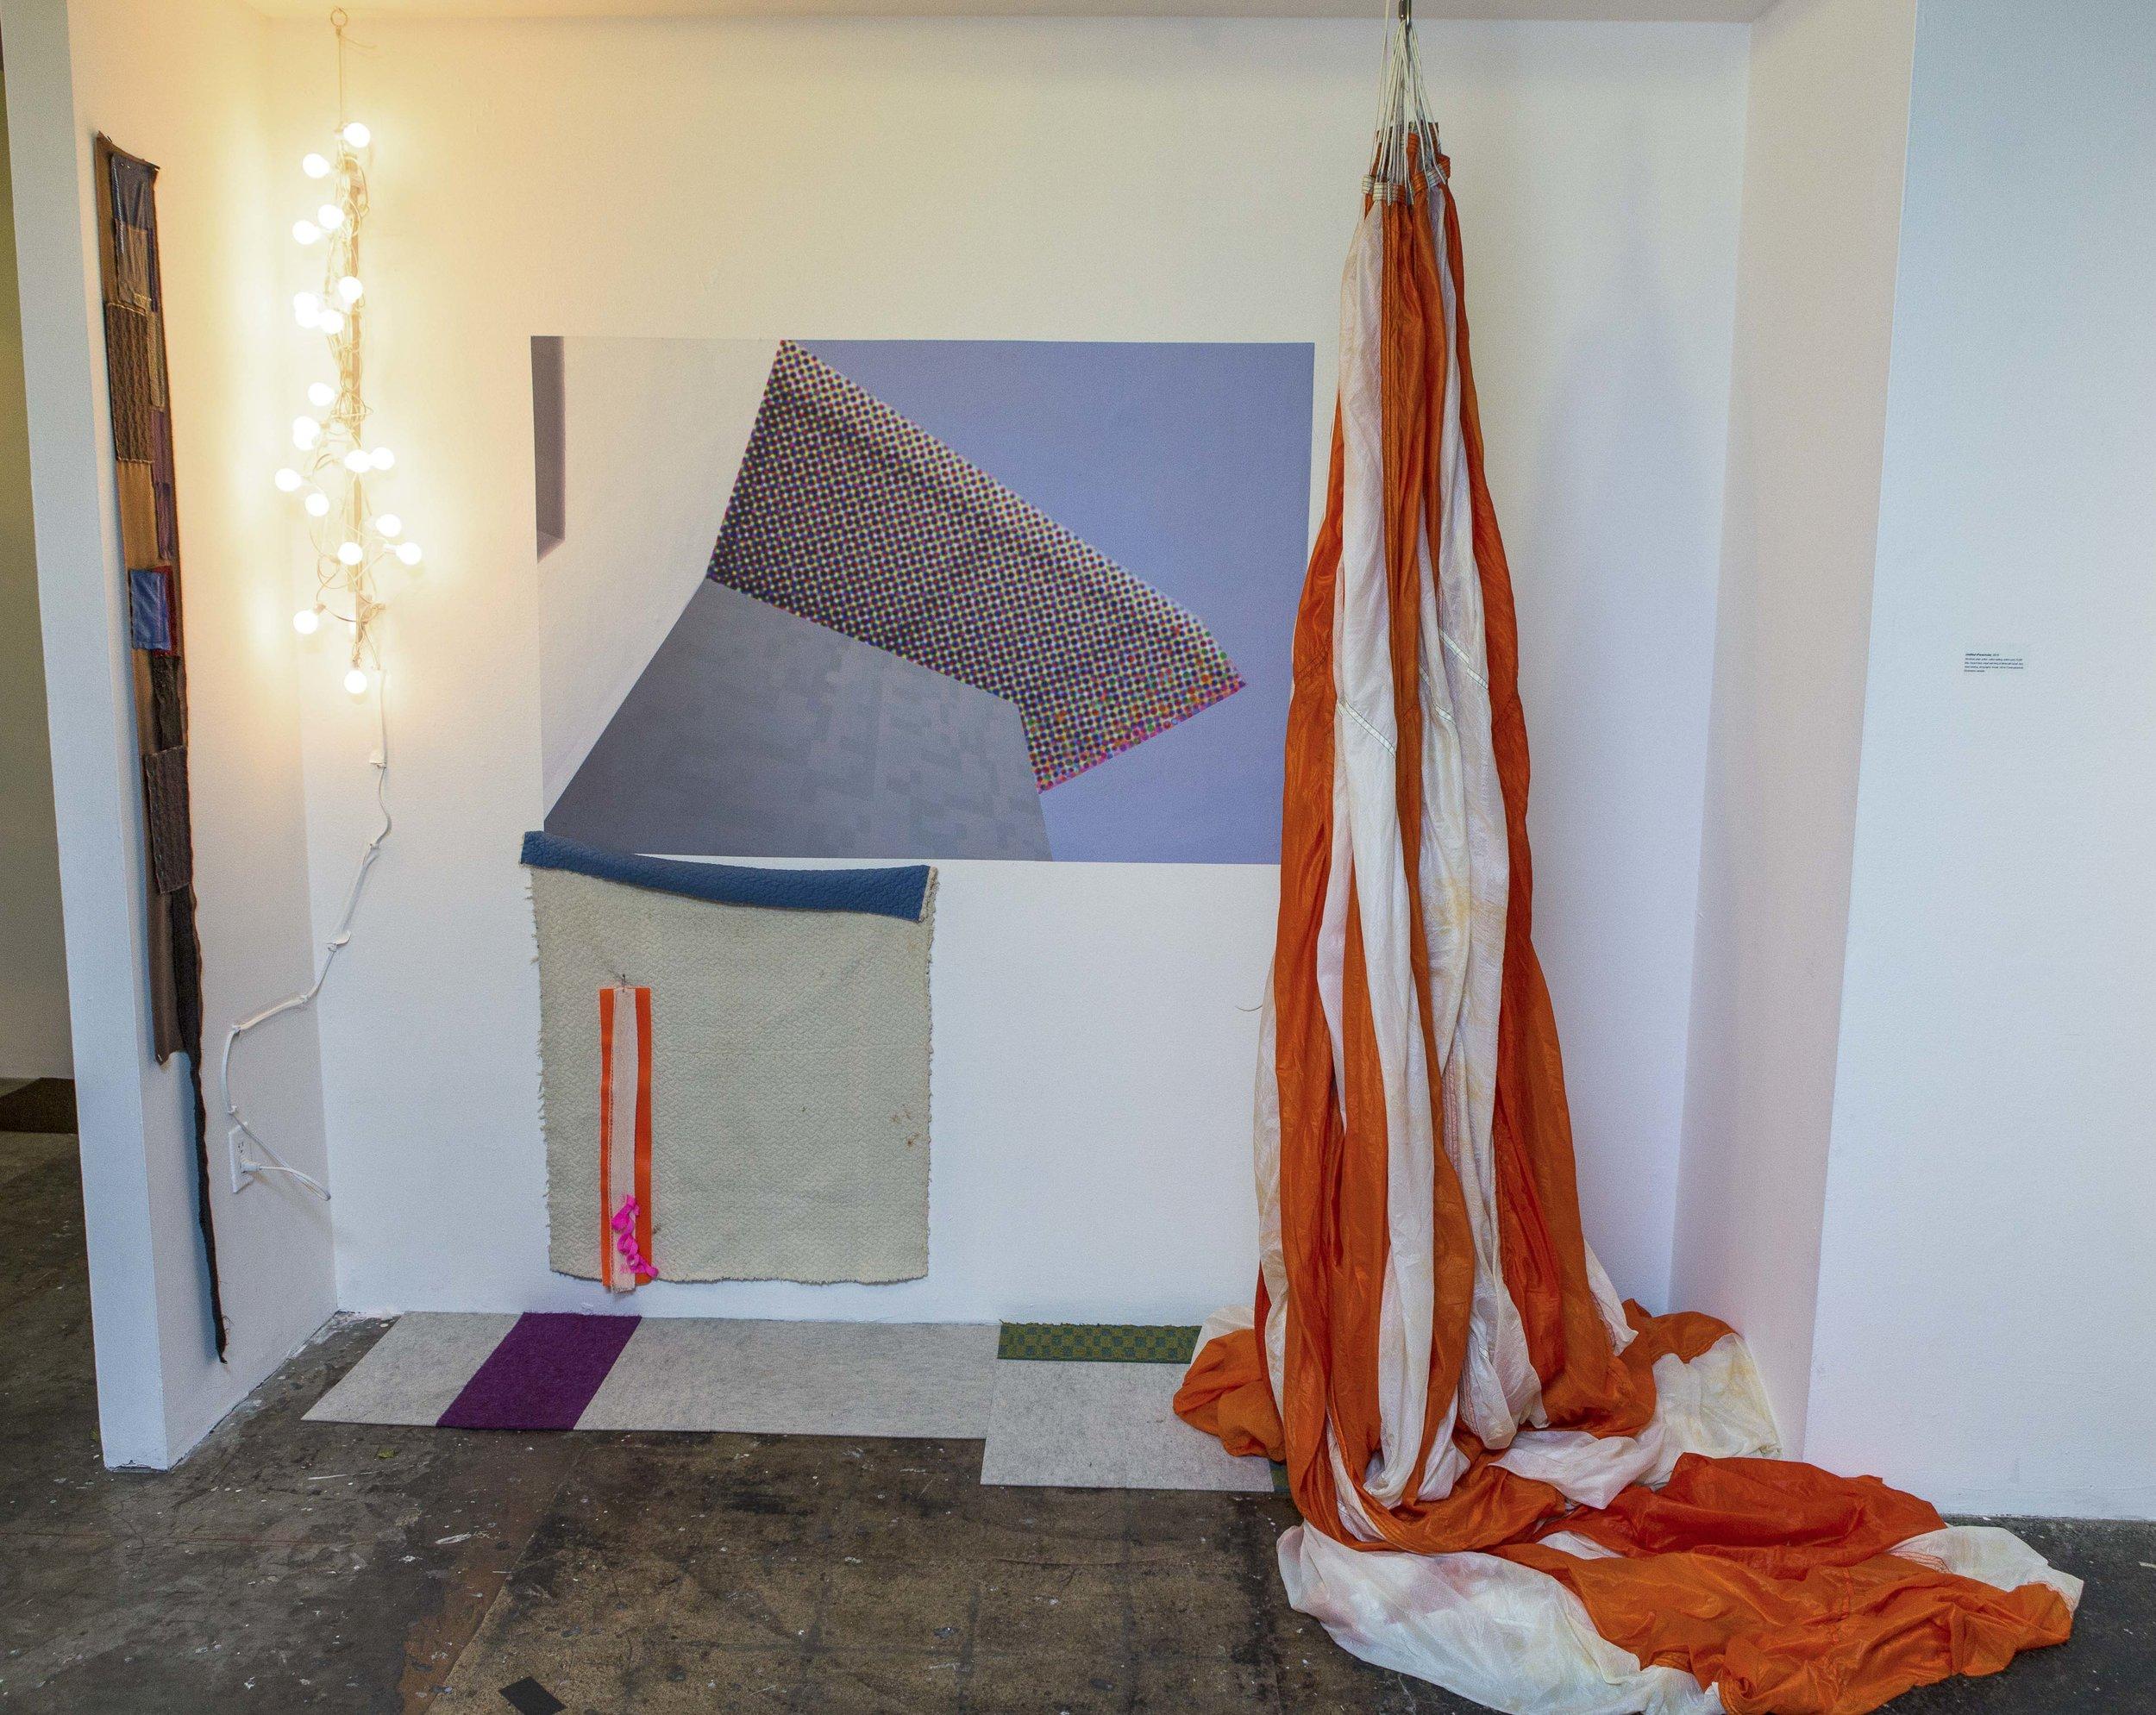 Untitled (parachute)